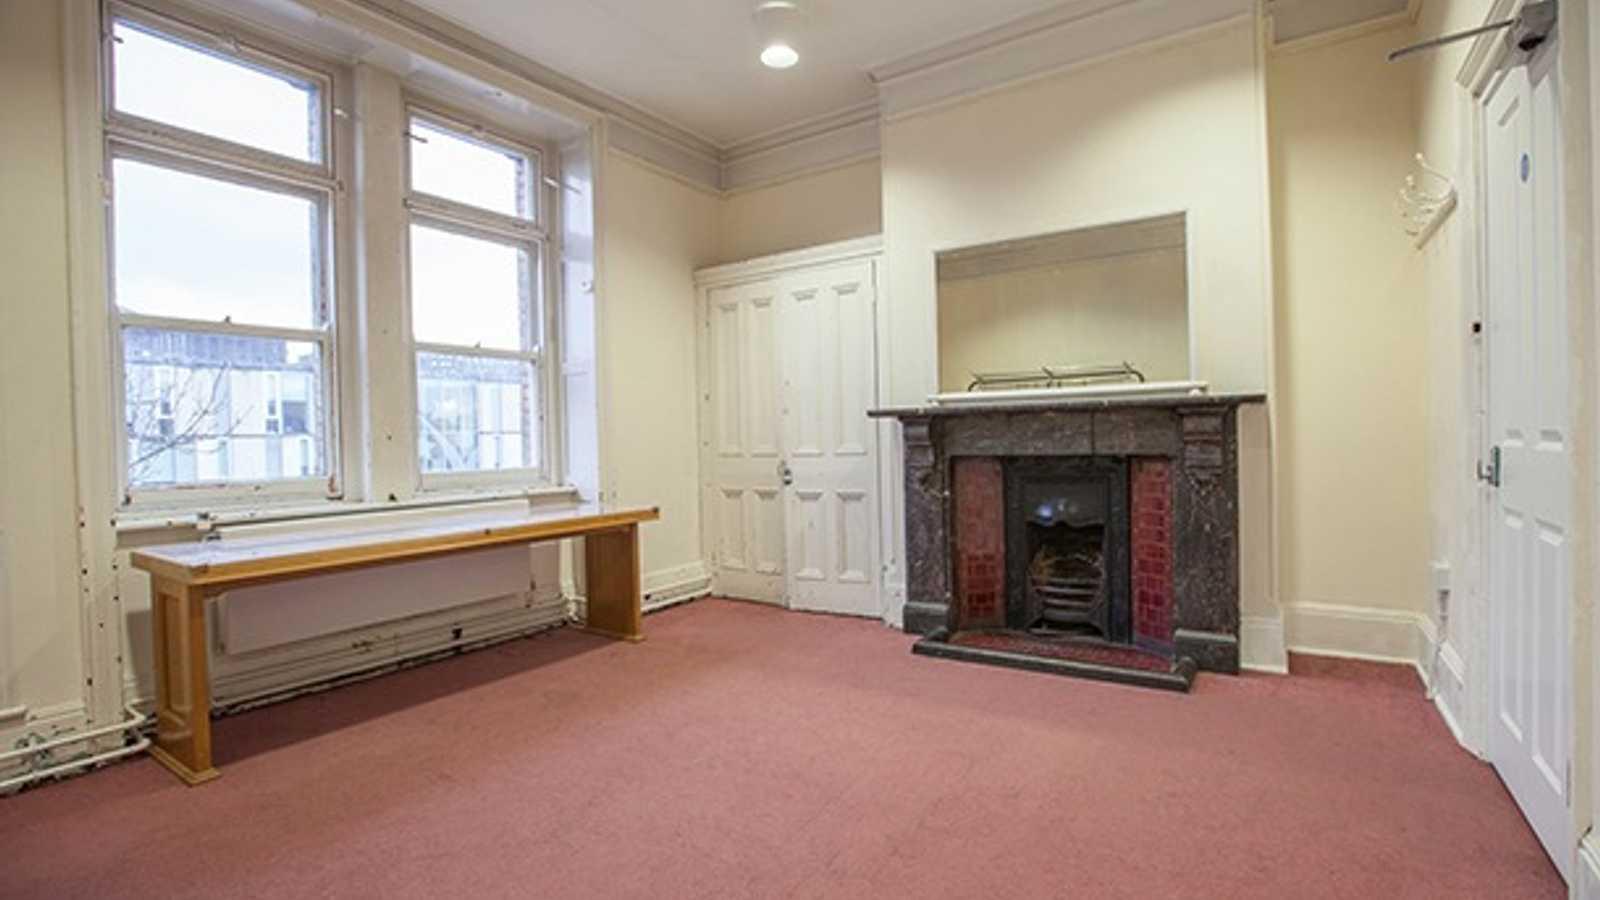 Carpet dressing room